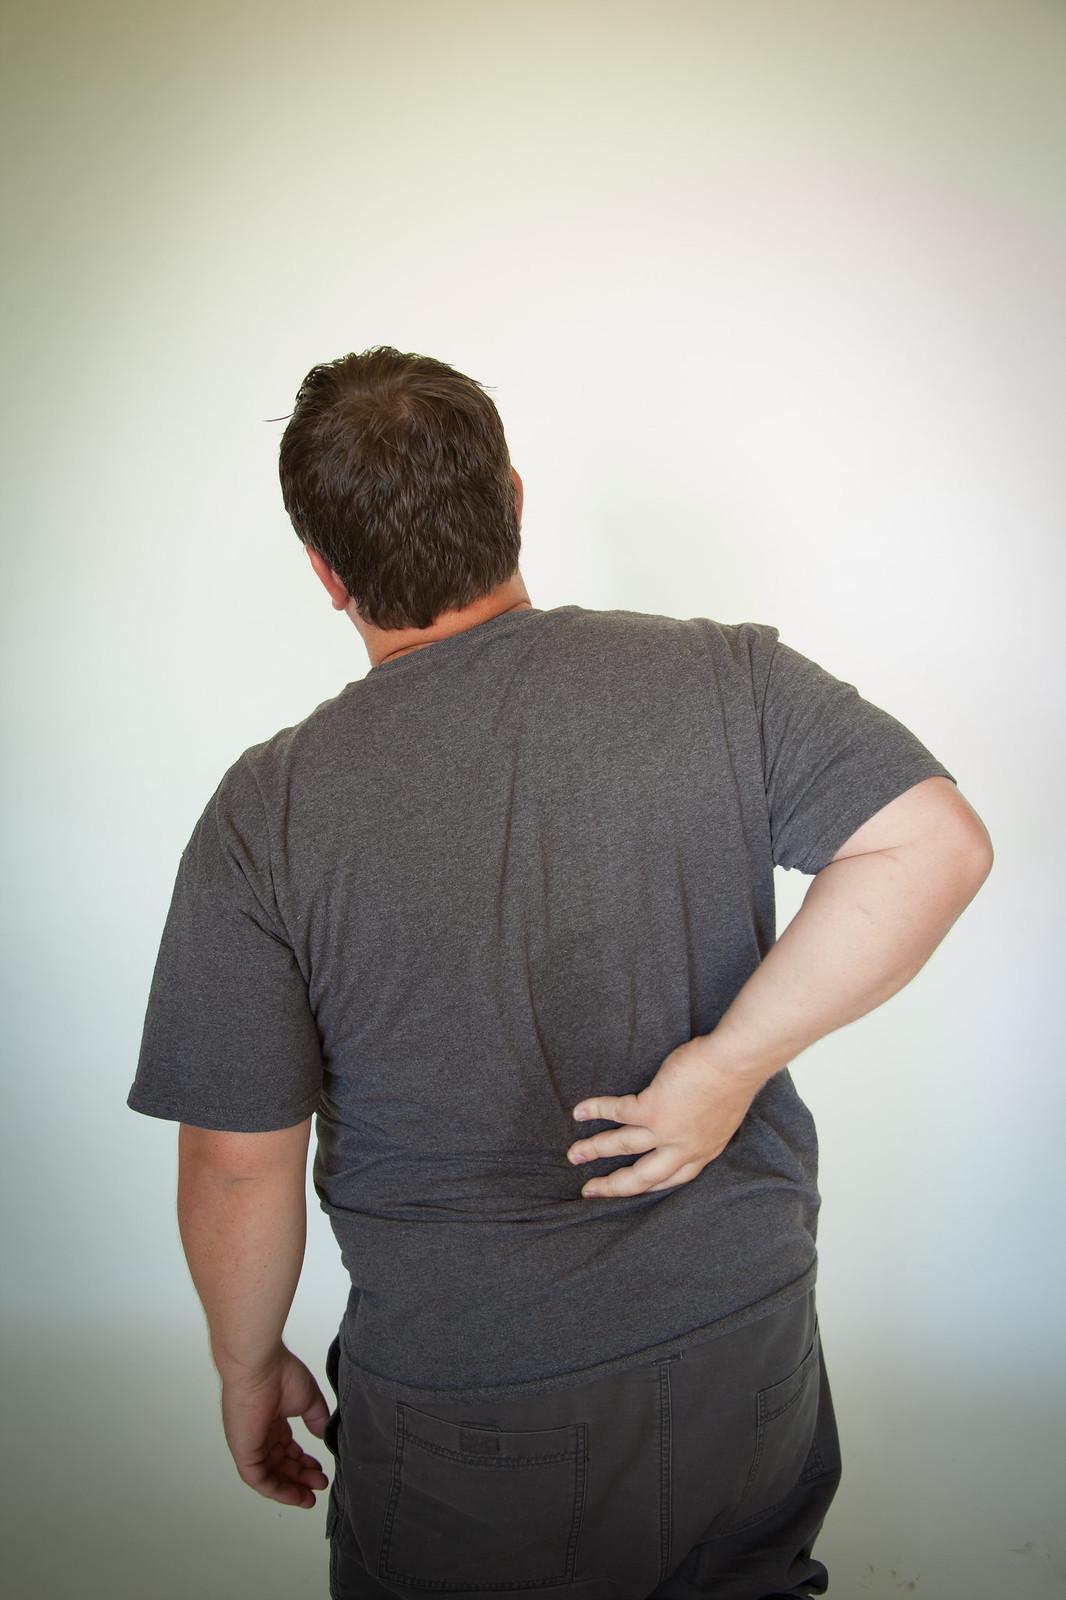 Personal Injury Back Pain